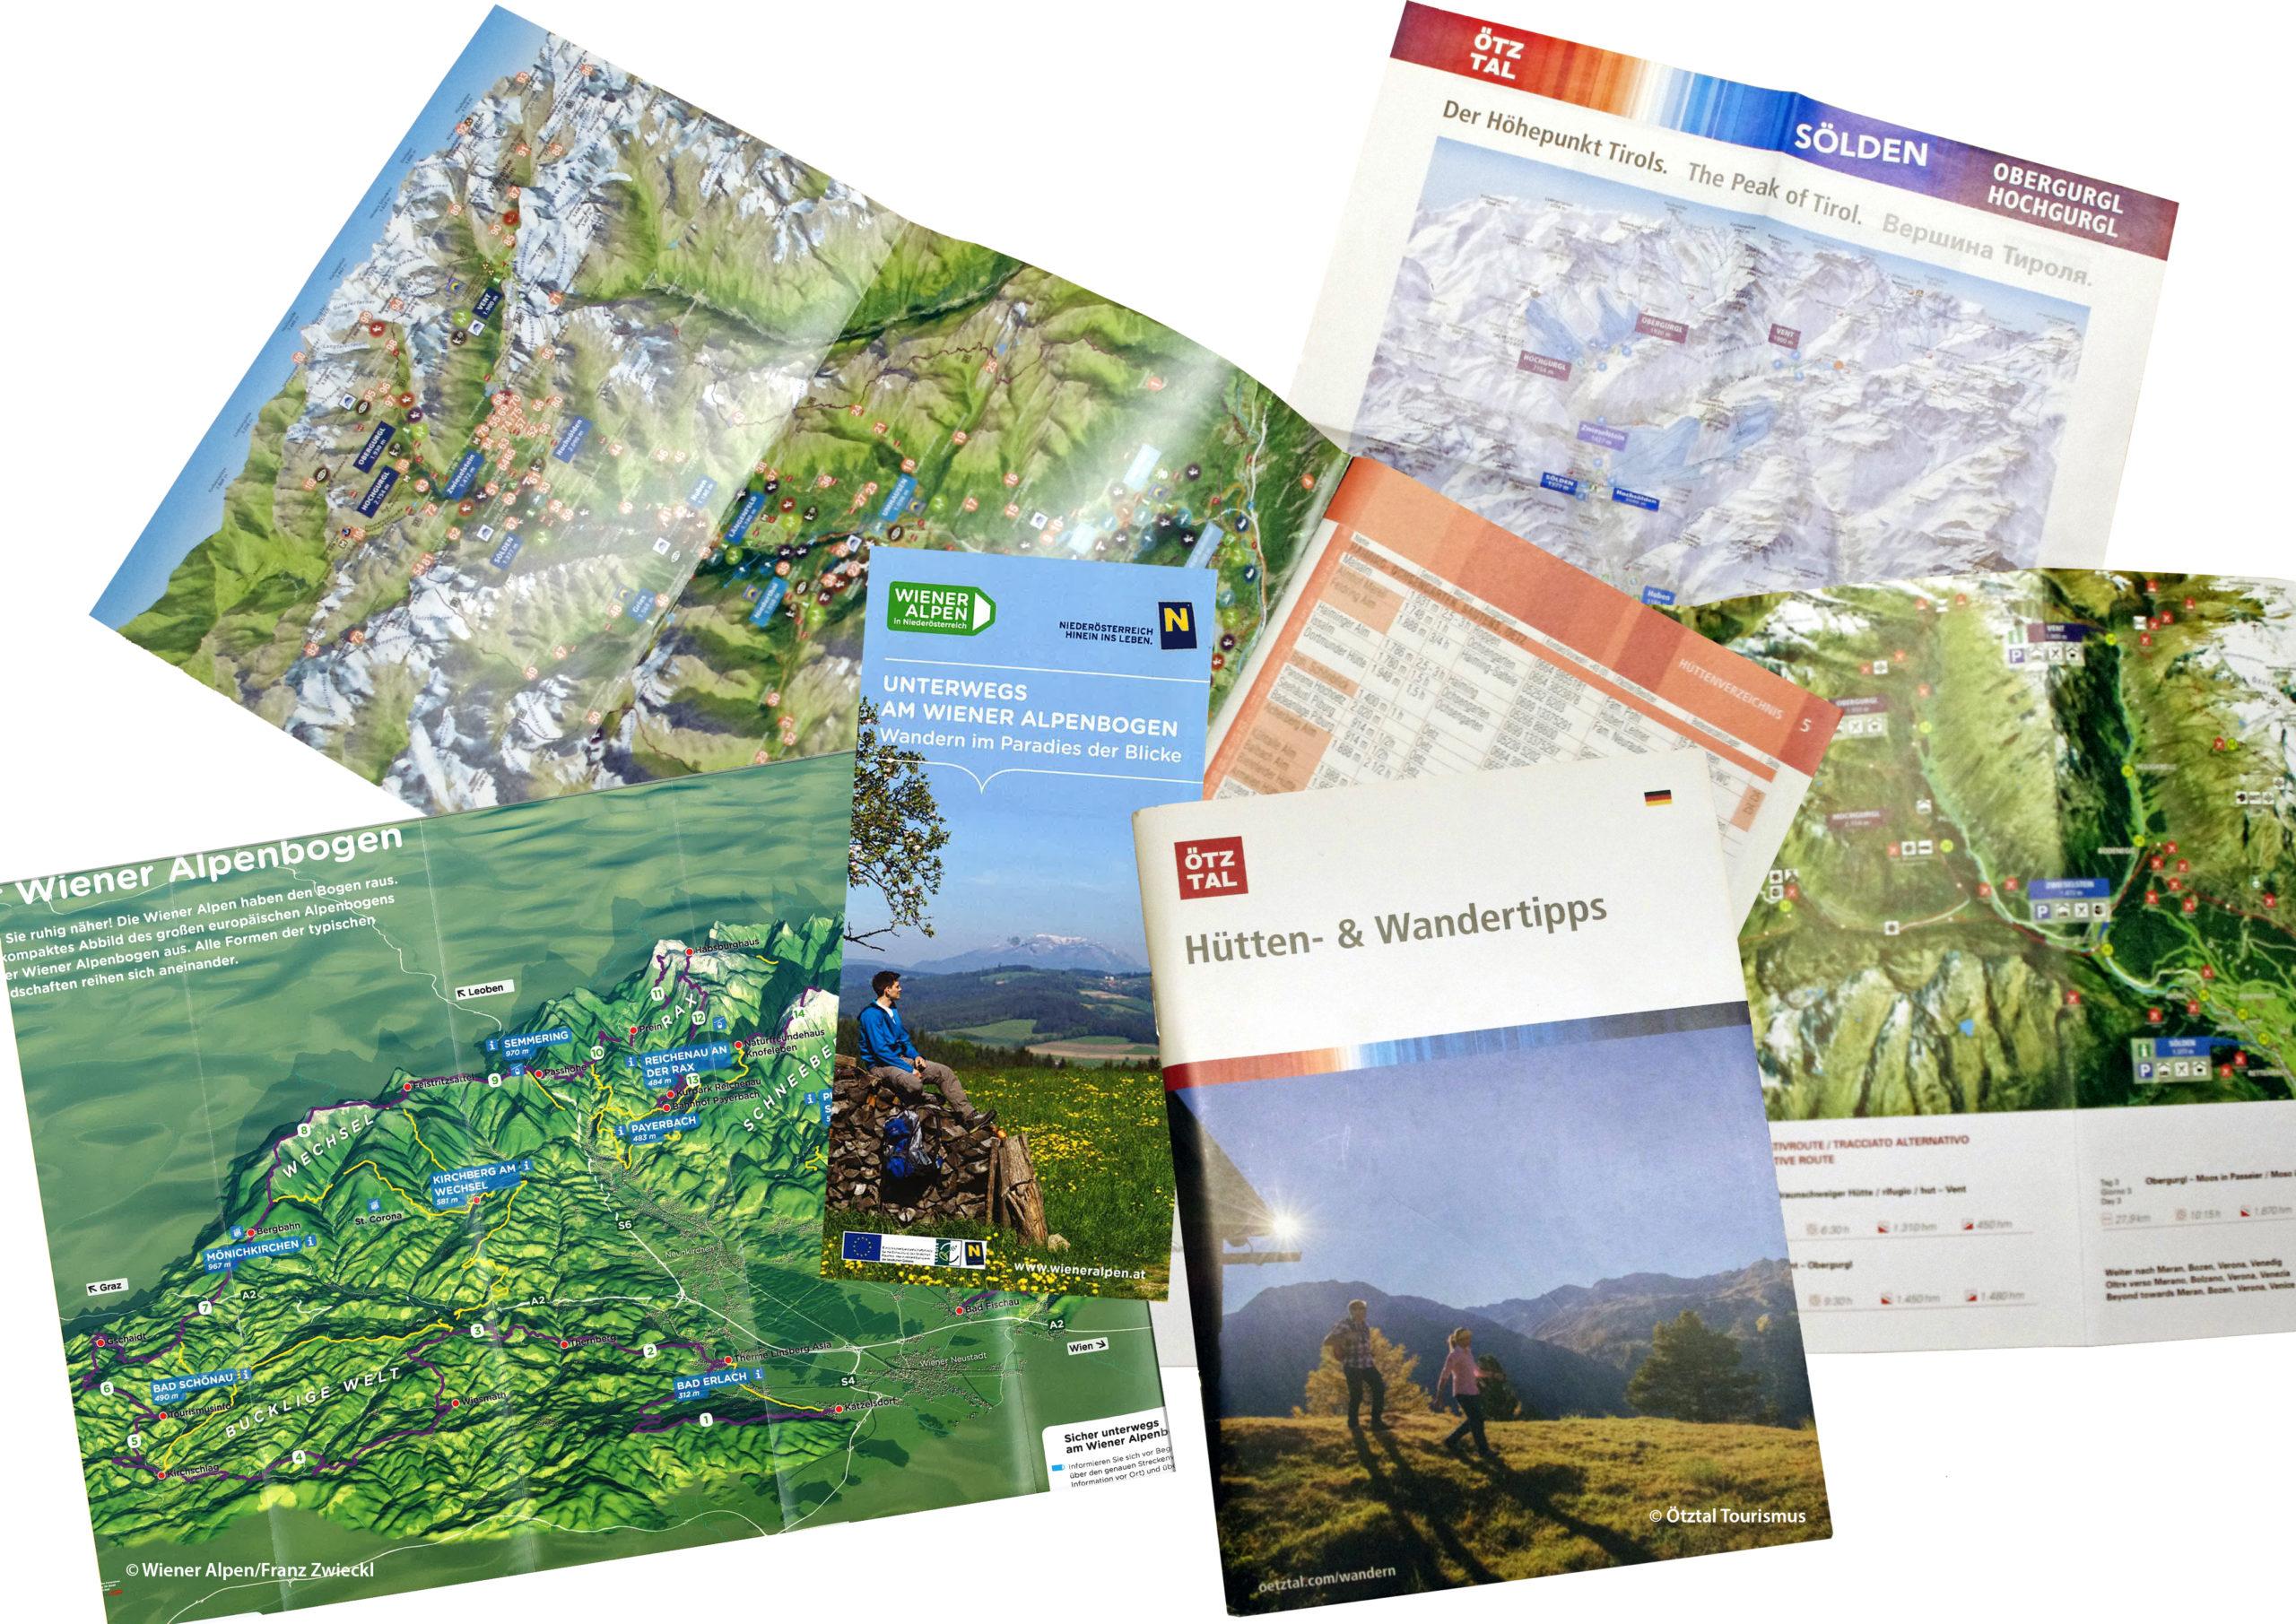 3D Panoramakarte 3D Printkarte Oetztal Wiener Alpen